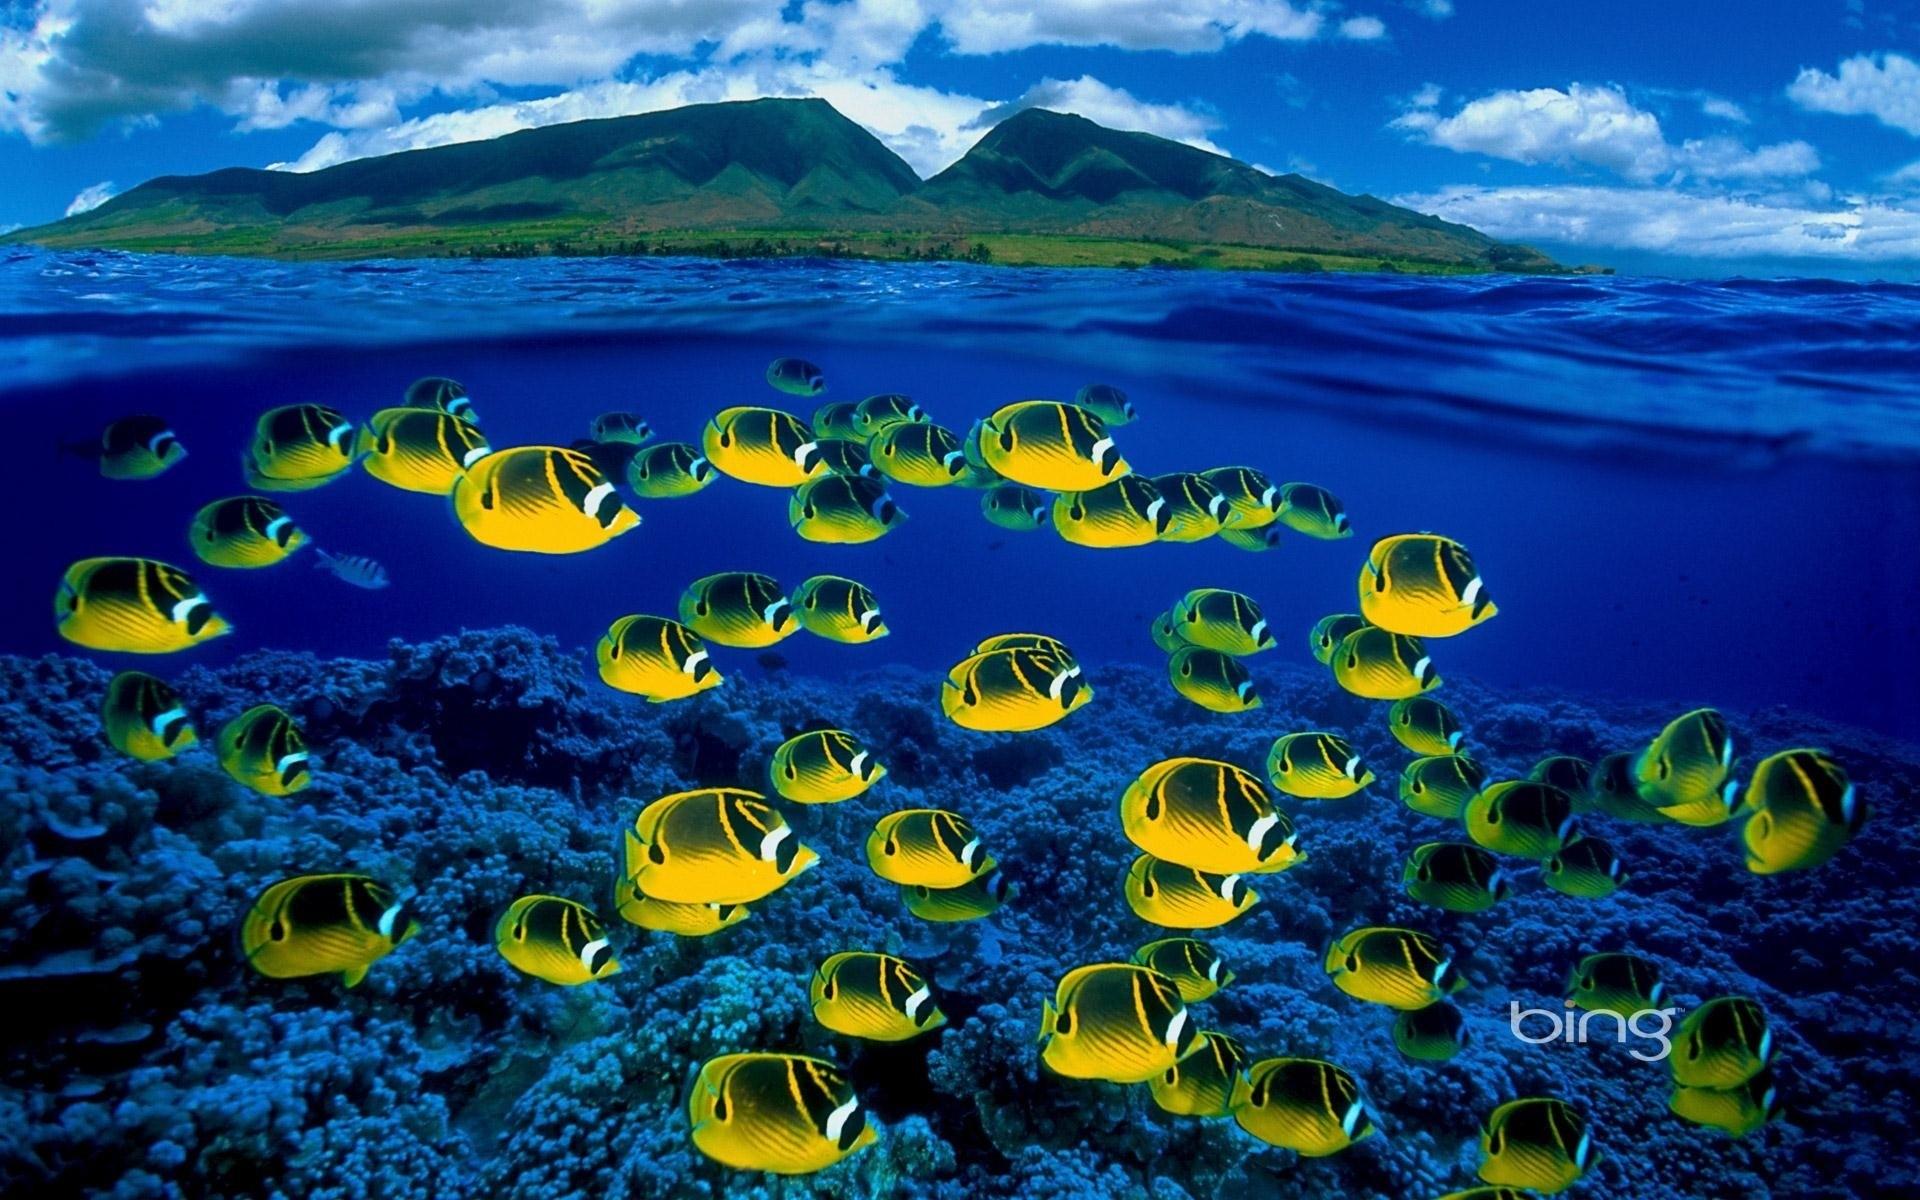 Res: 1920x1200, Maui, Hawaii, Underwater, Reef, Corals, Fish, Sea, Saltwater,